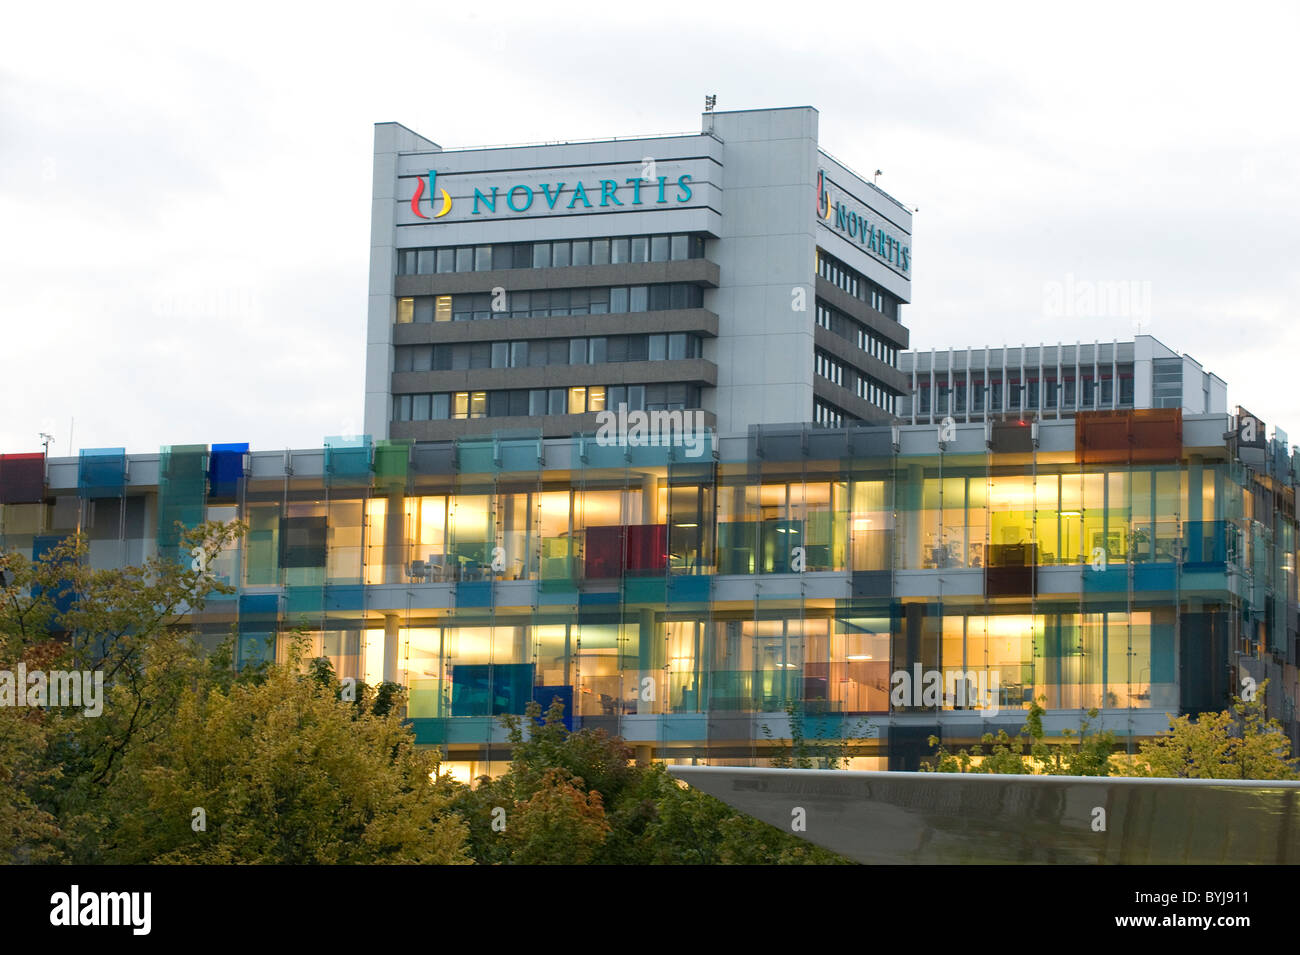 Image Gallery Novartis Basel